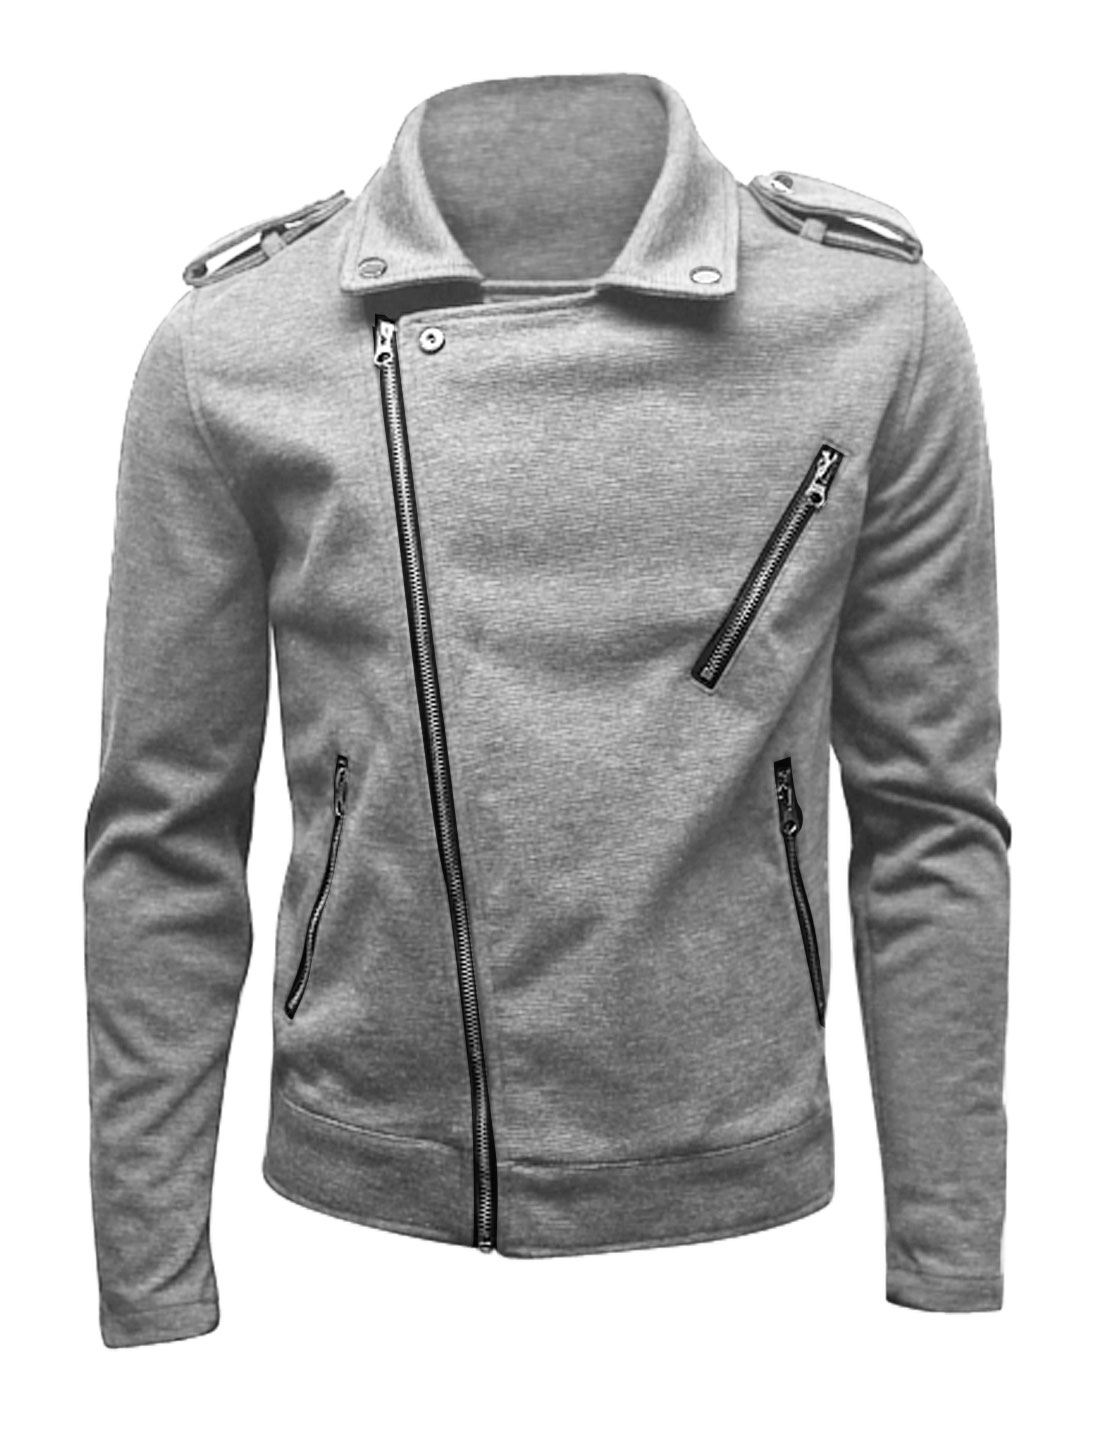 Light Gray Men Long Sleeves Full Zip Trendy Jackets M